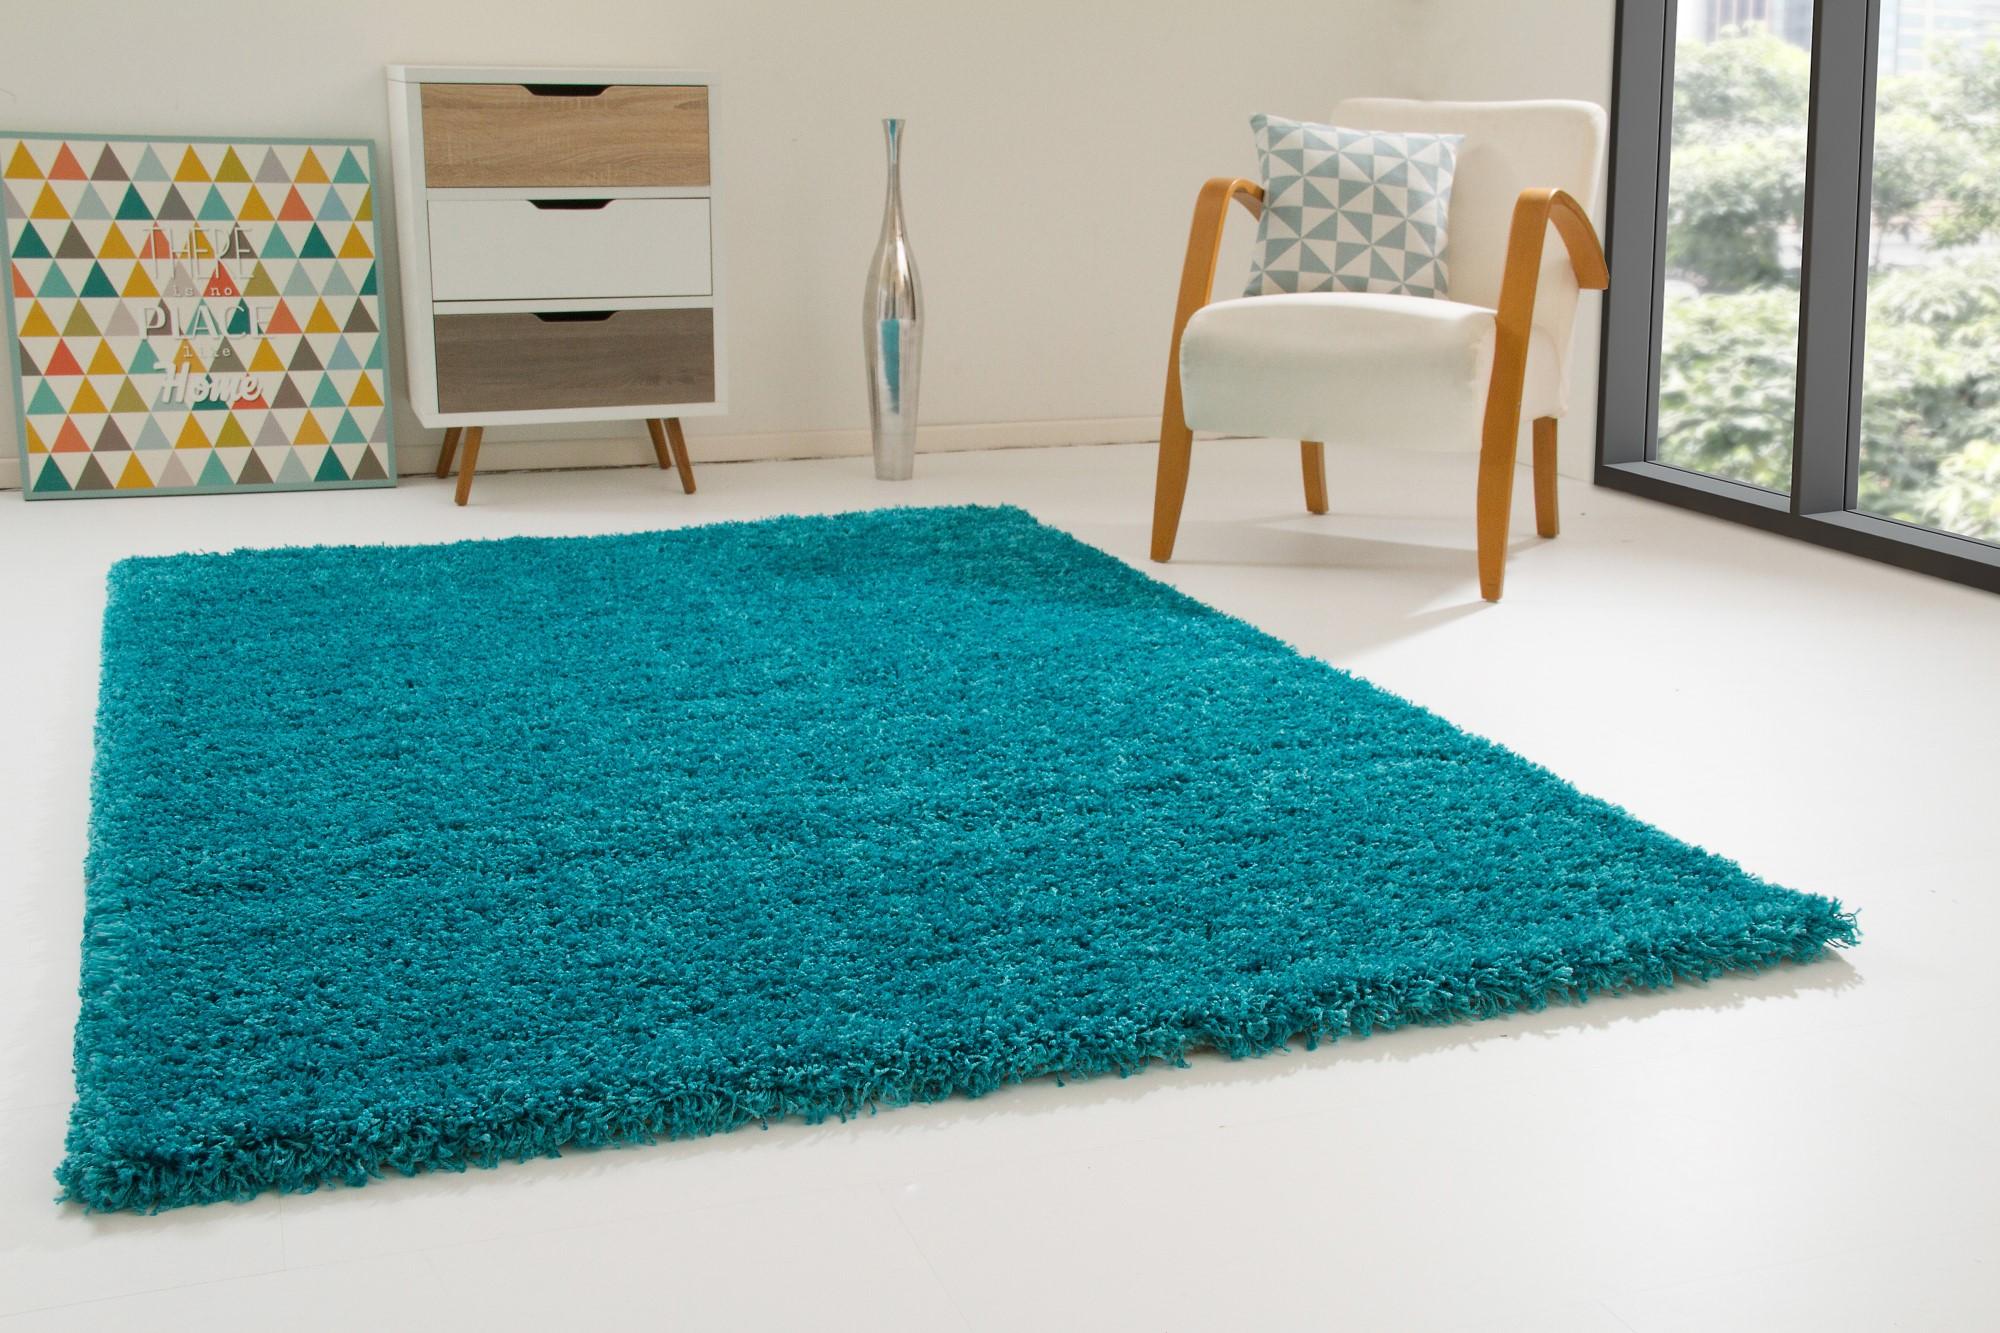 langflor hochflor teppich happy xl top qualit t 2600 g qm kuschel shaggy neu ebay. Black Bedroom Furniture Sets. Home Design Ideas